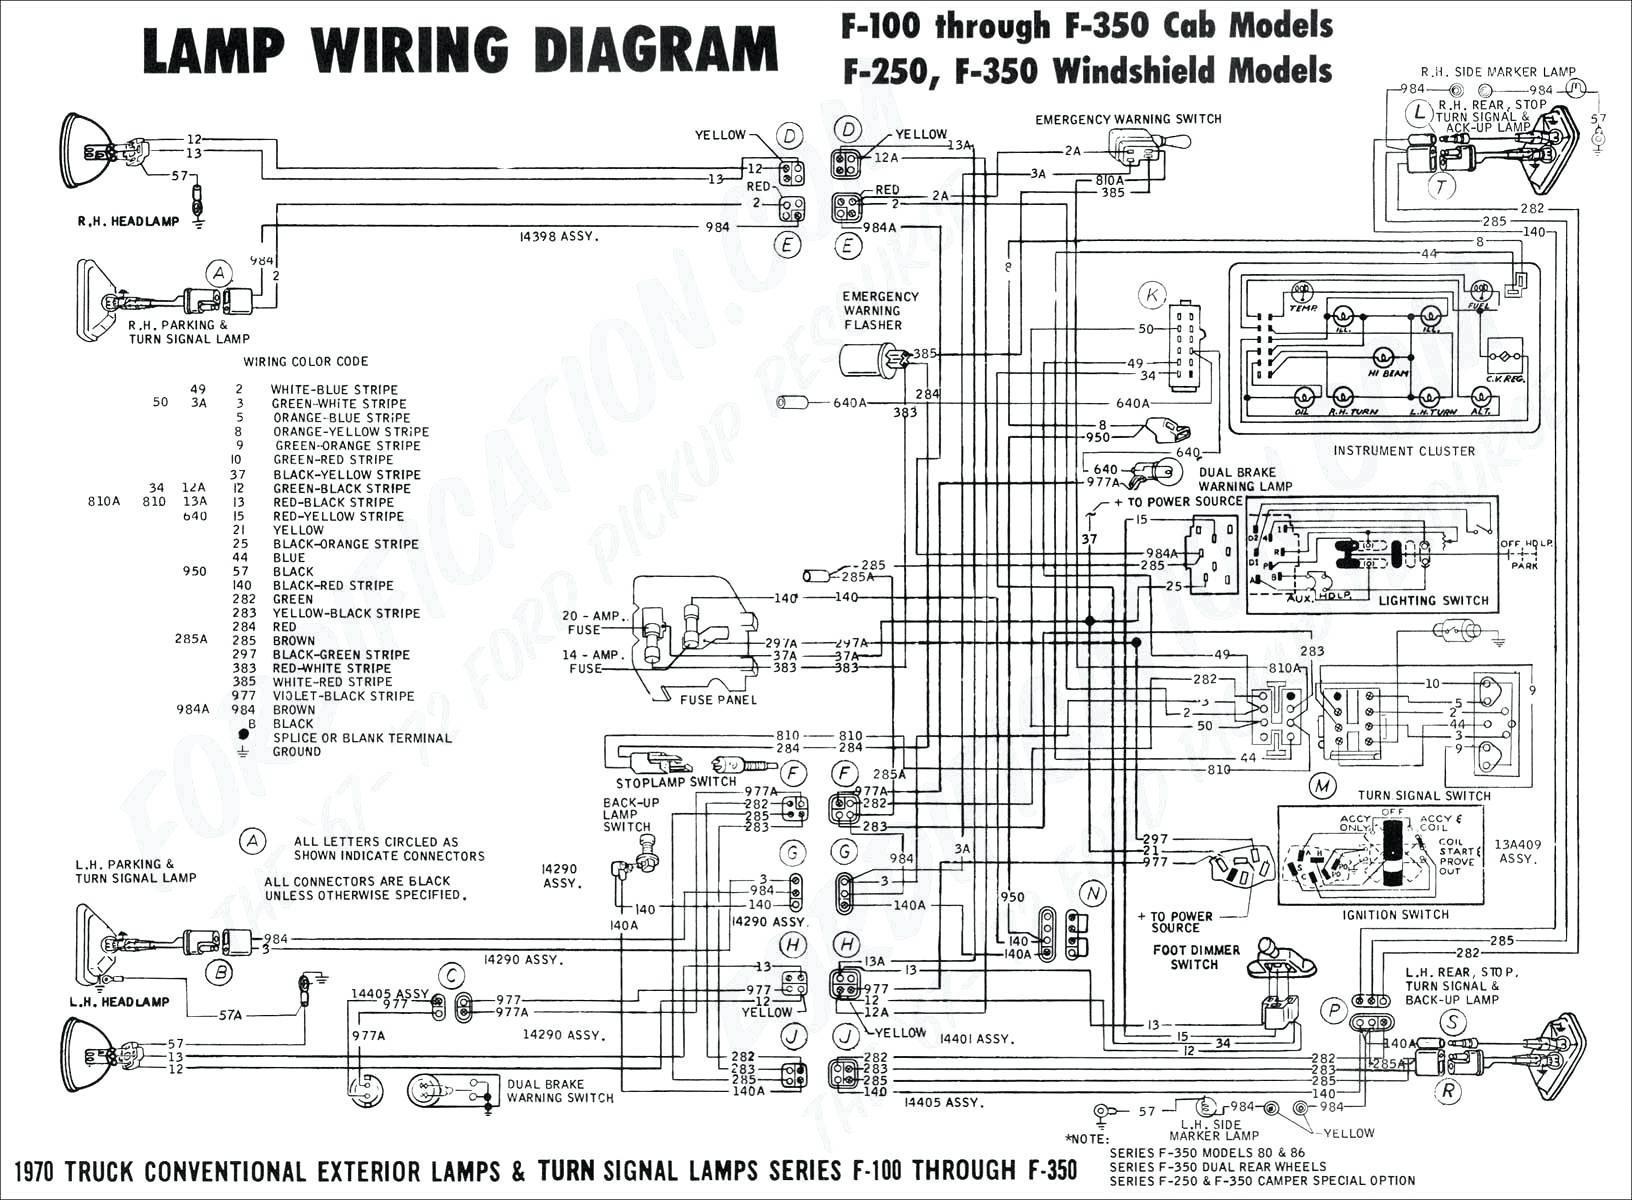 2004 radio wiring dodge 1500 infinity images wiring diagram used dodge ram infinity and wiring diagram